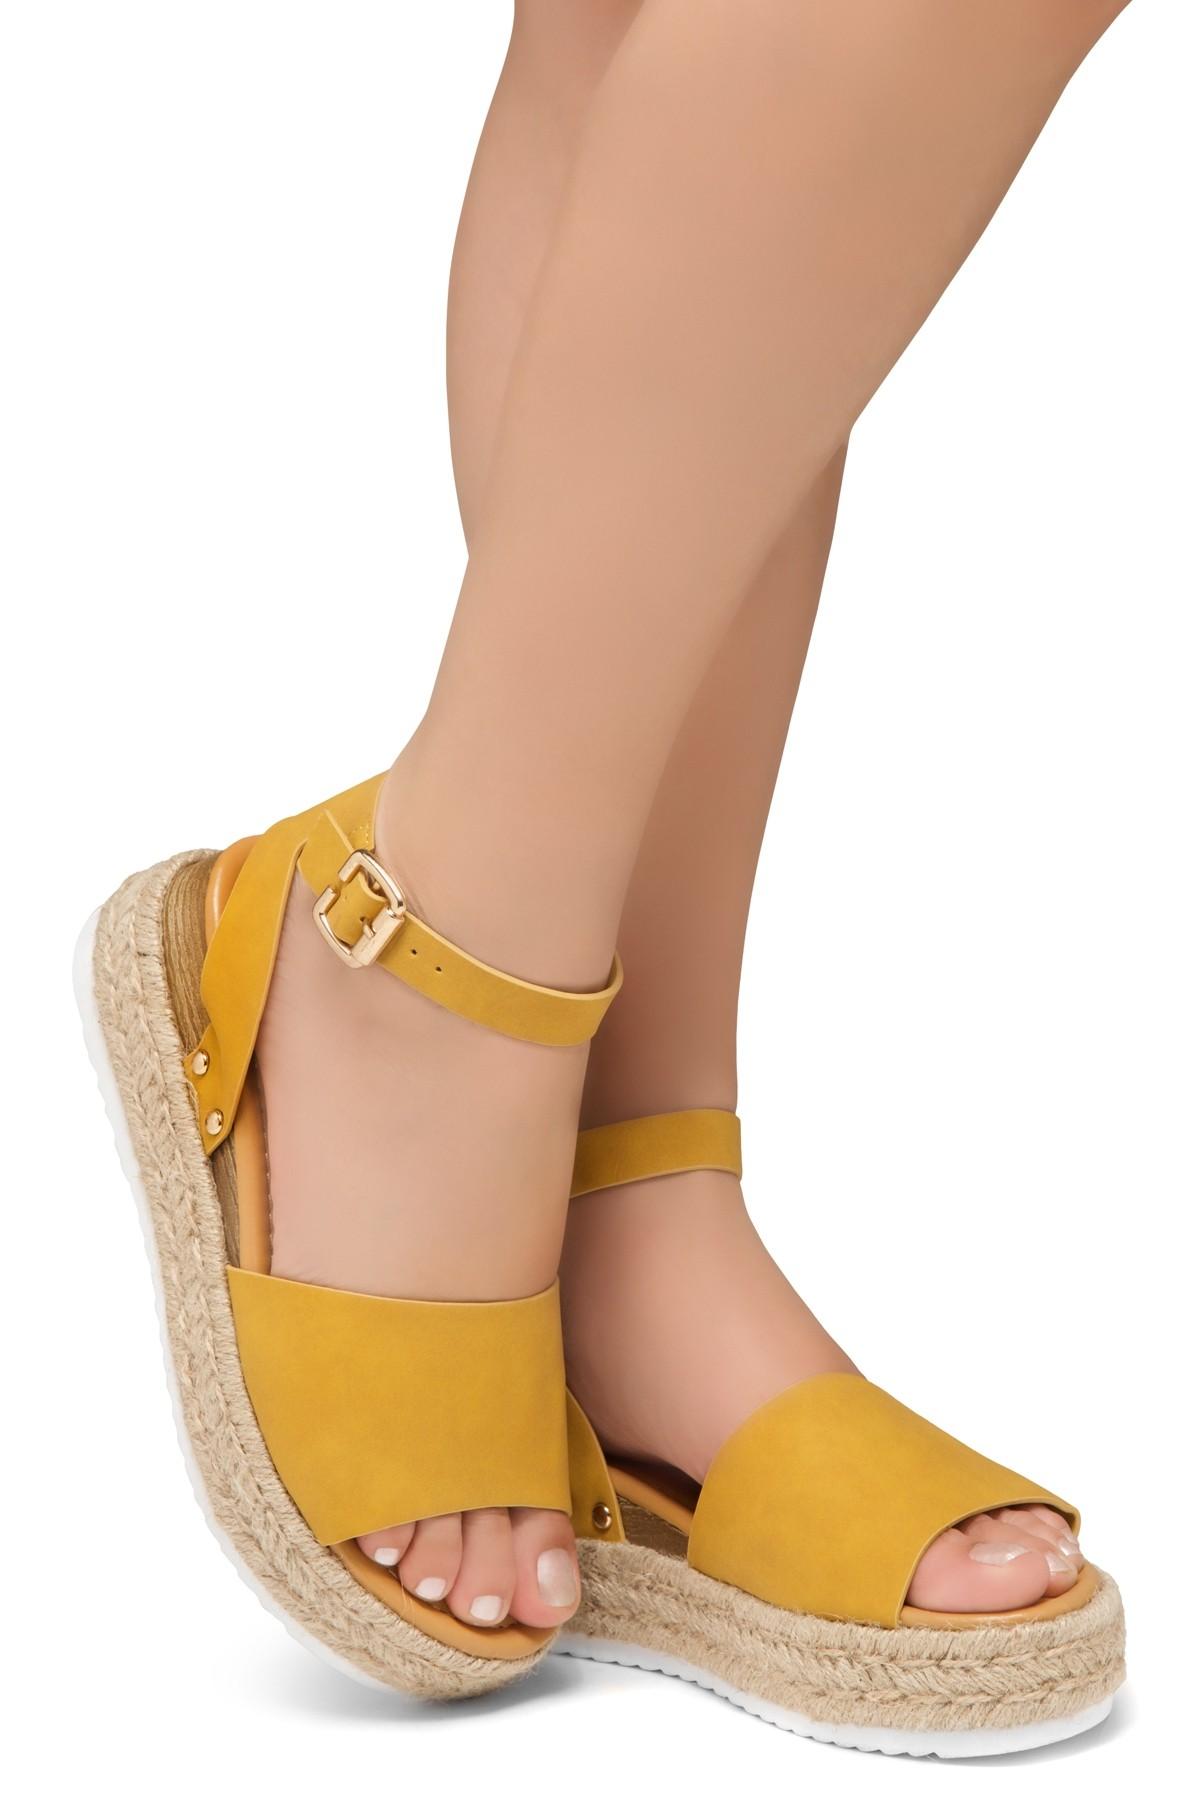 Shoe Land Legossa-Women's Open Toe